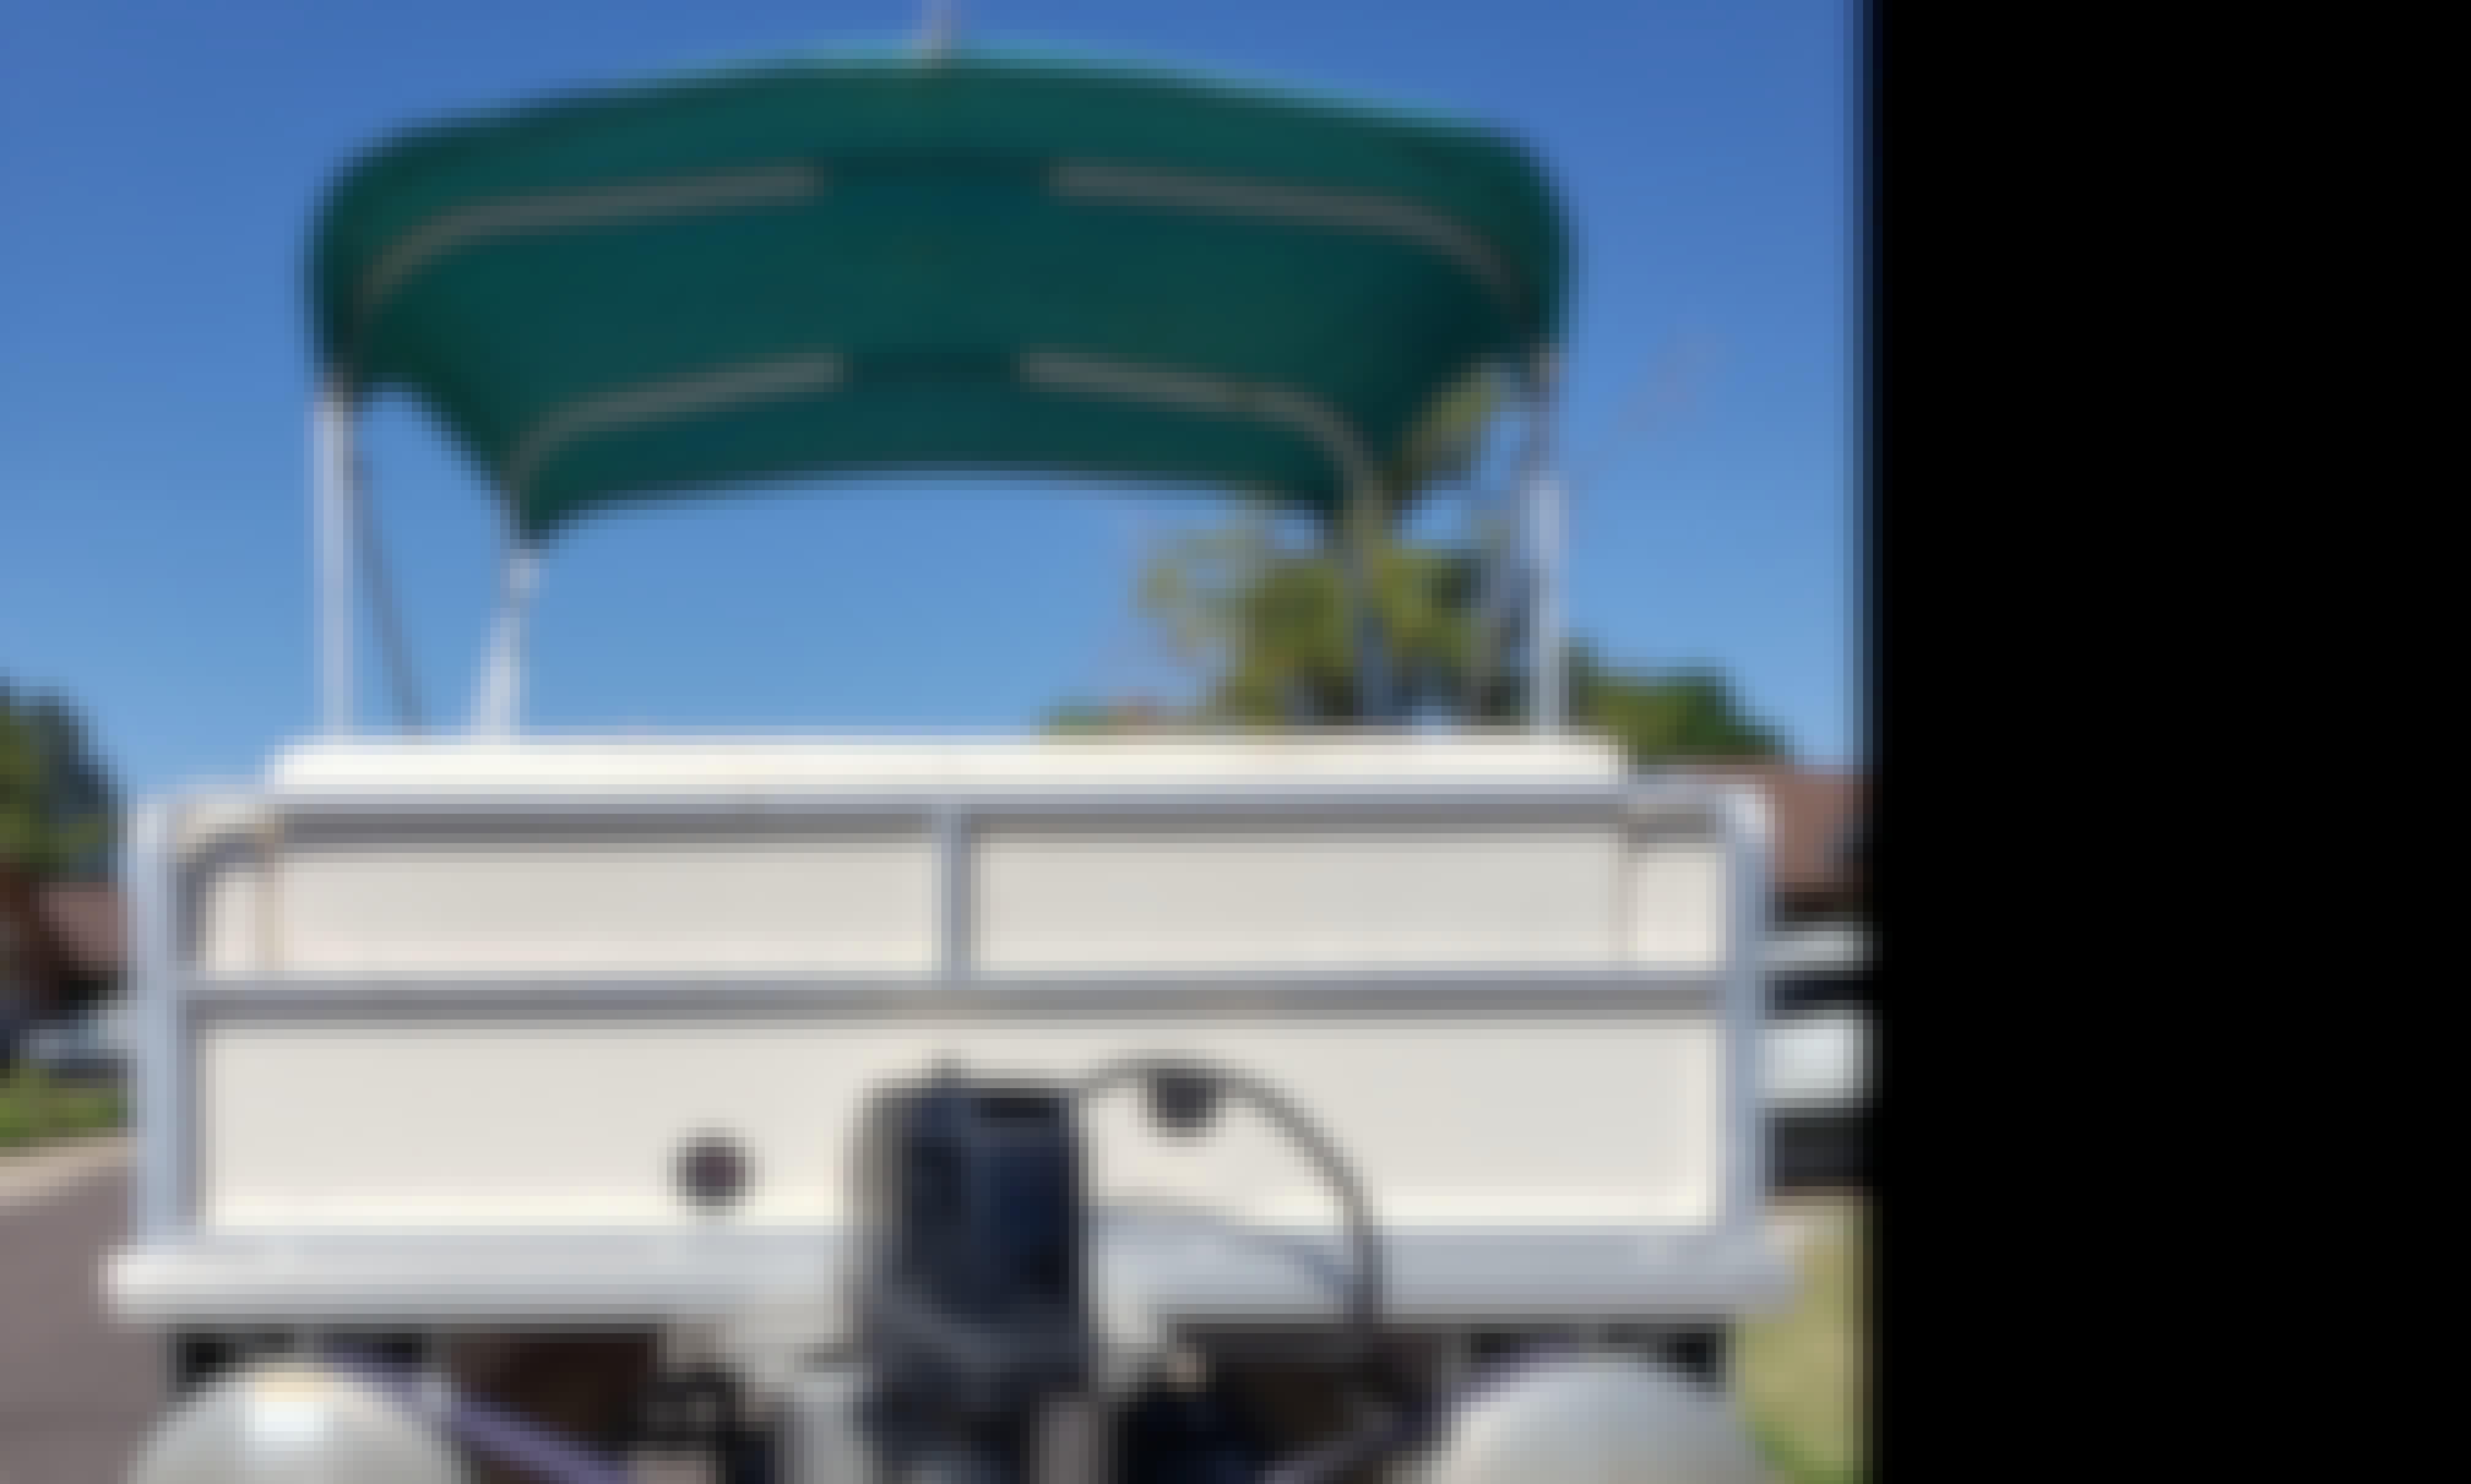 17' Sun Tracker Pontoon for Rent in Mesa